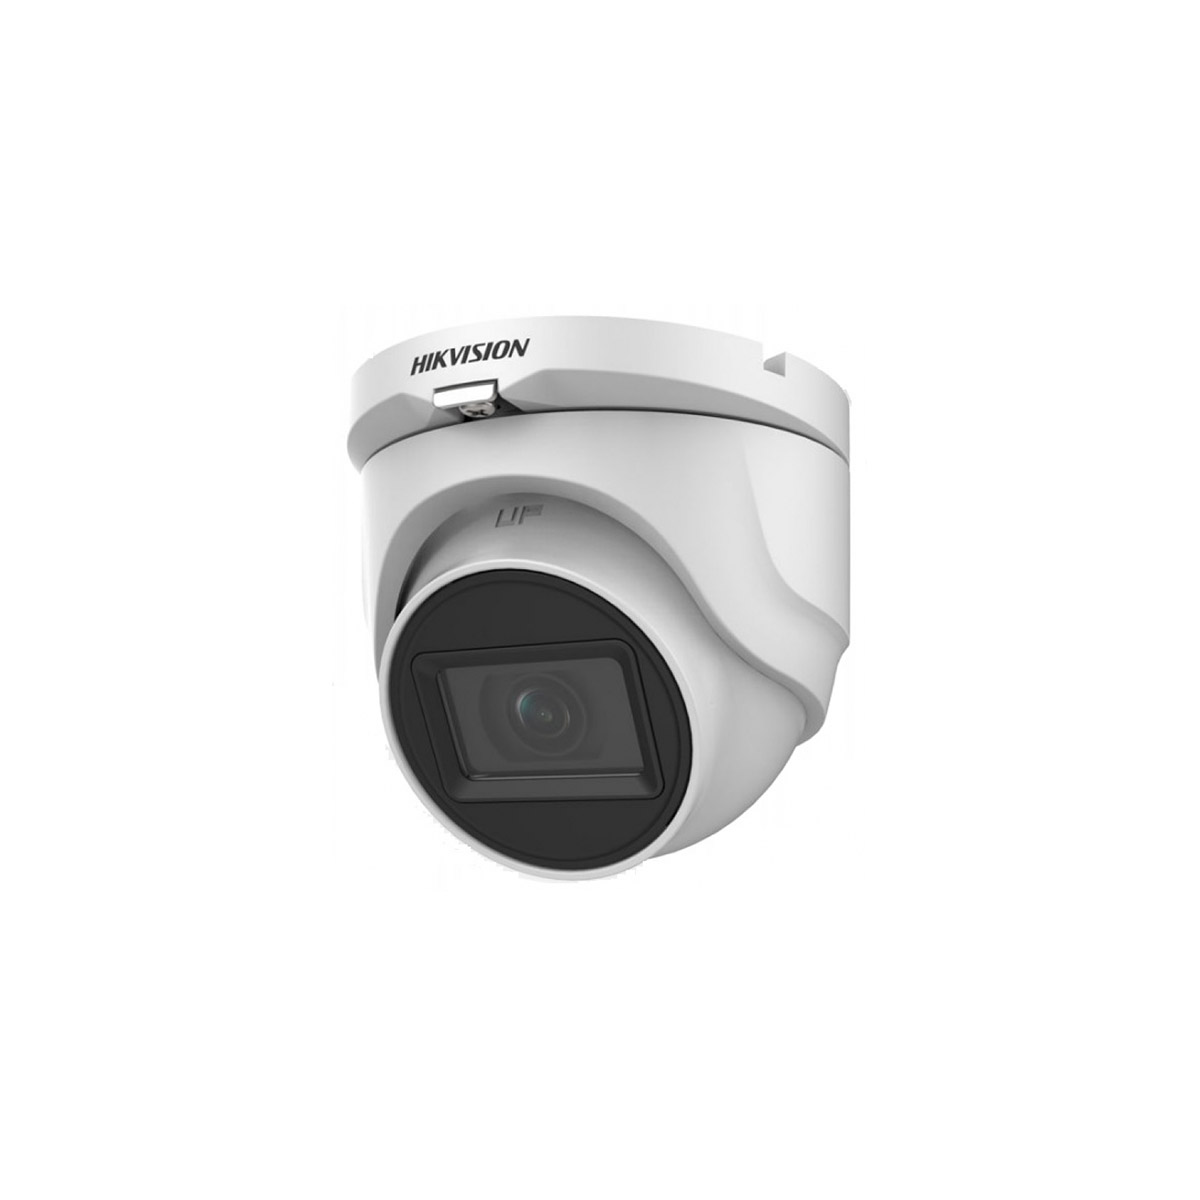 Cámara Hikvision DS-2CE76H0T-ITMF 5MP Tipo Domo